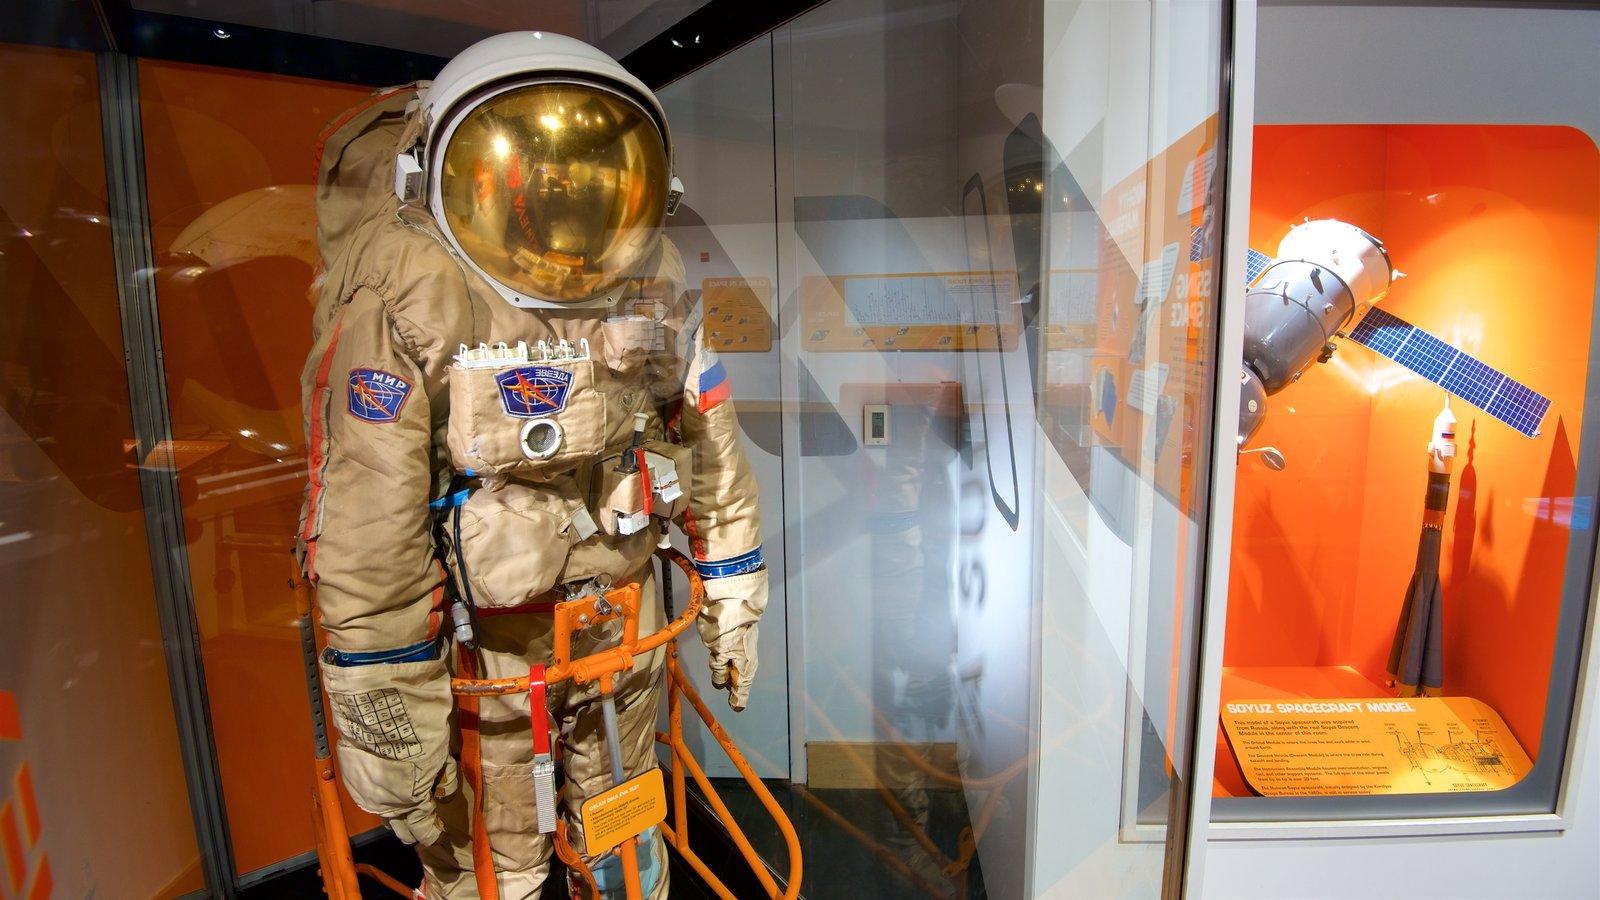 Chabot Space and Science Center mostrando vistas internas